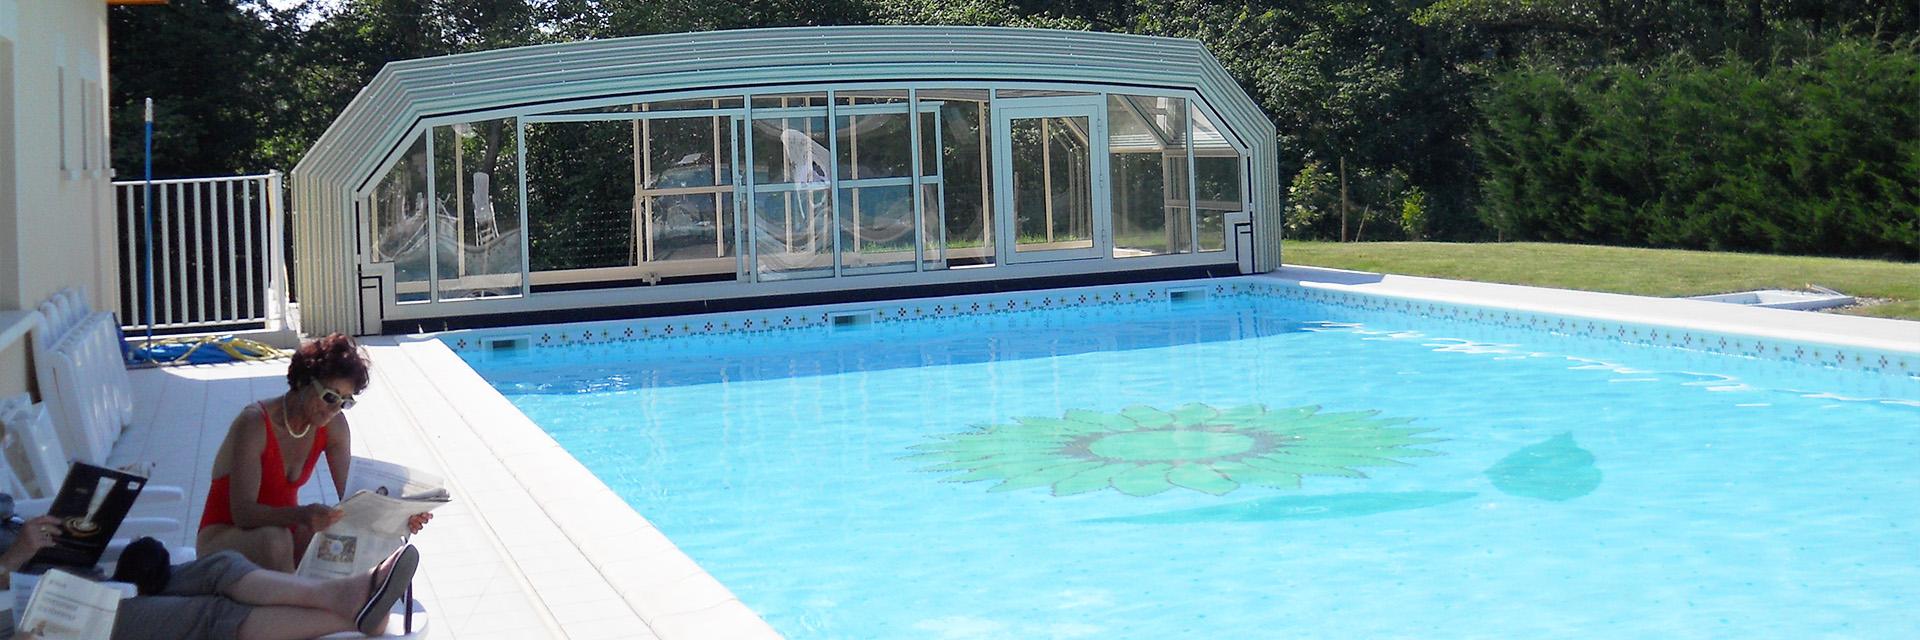 Village_club_vacances_gers-et-aquitaine-tournesols-du-gers-piscine-ete